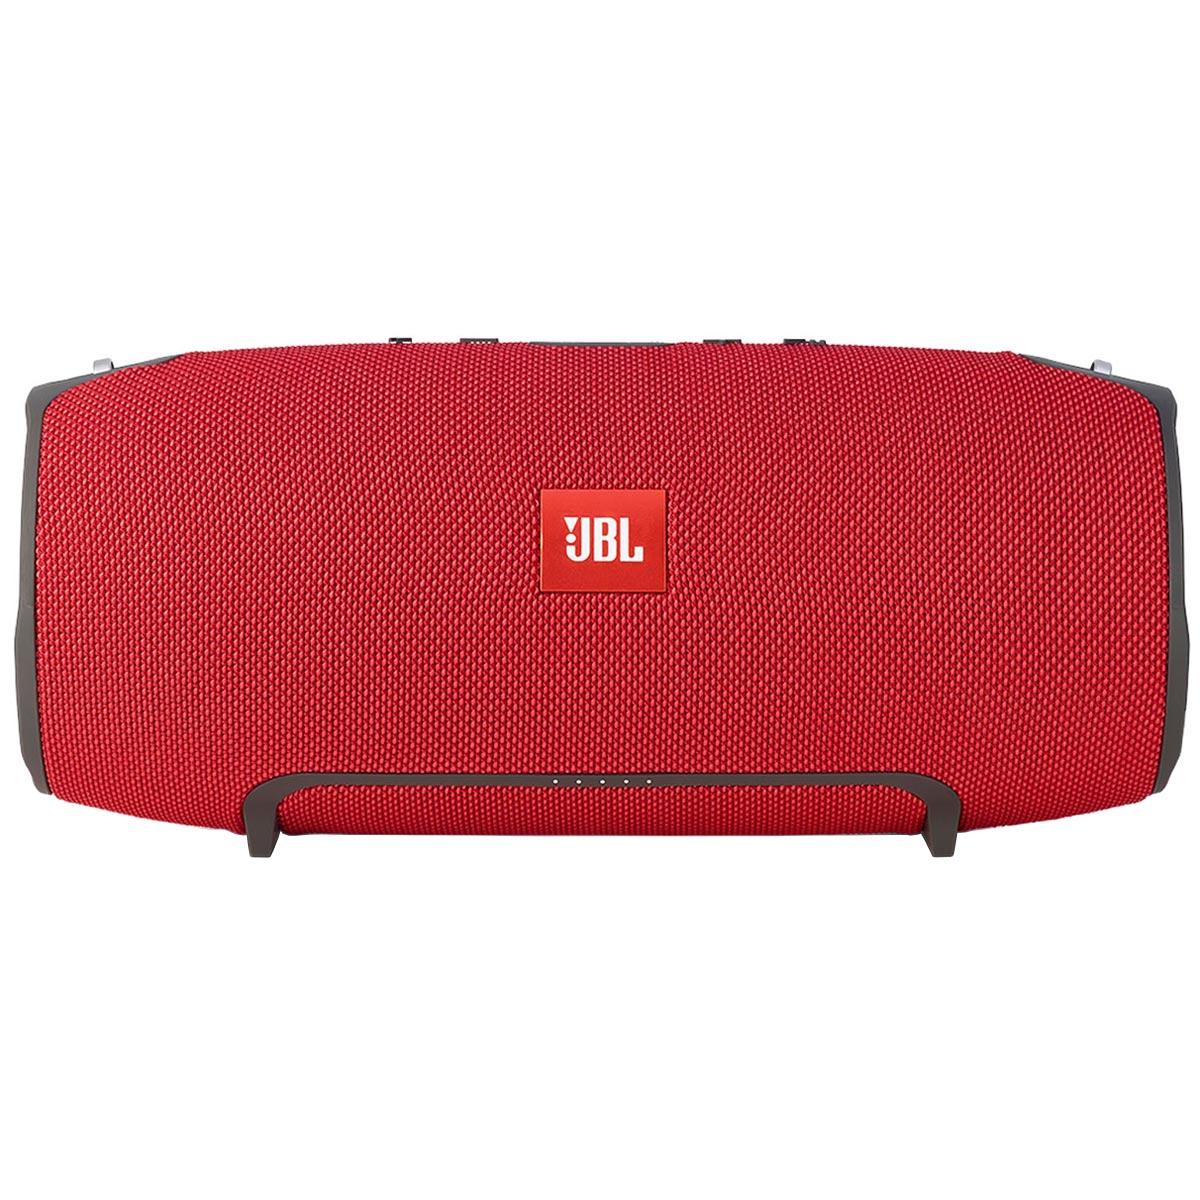 Caixa de Som Portátil c/ Bluetooth JBL Xtreme Vermelha - JBL